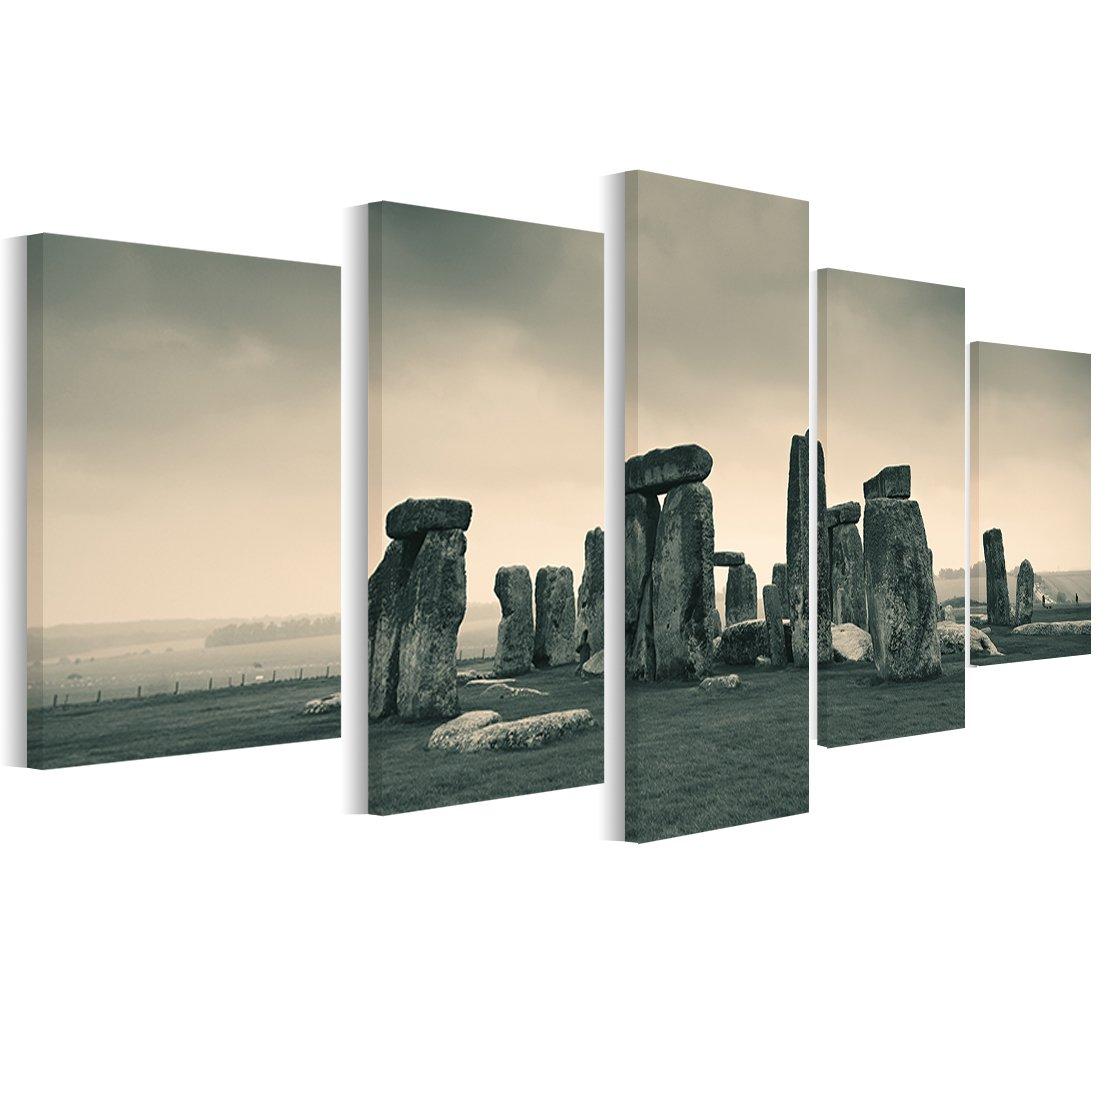 Stonehenge 1p Bild Bilder auf Leinwand Wandbild Poster